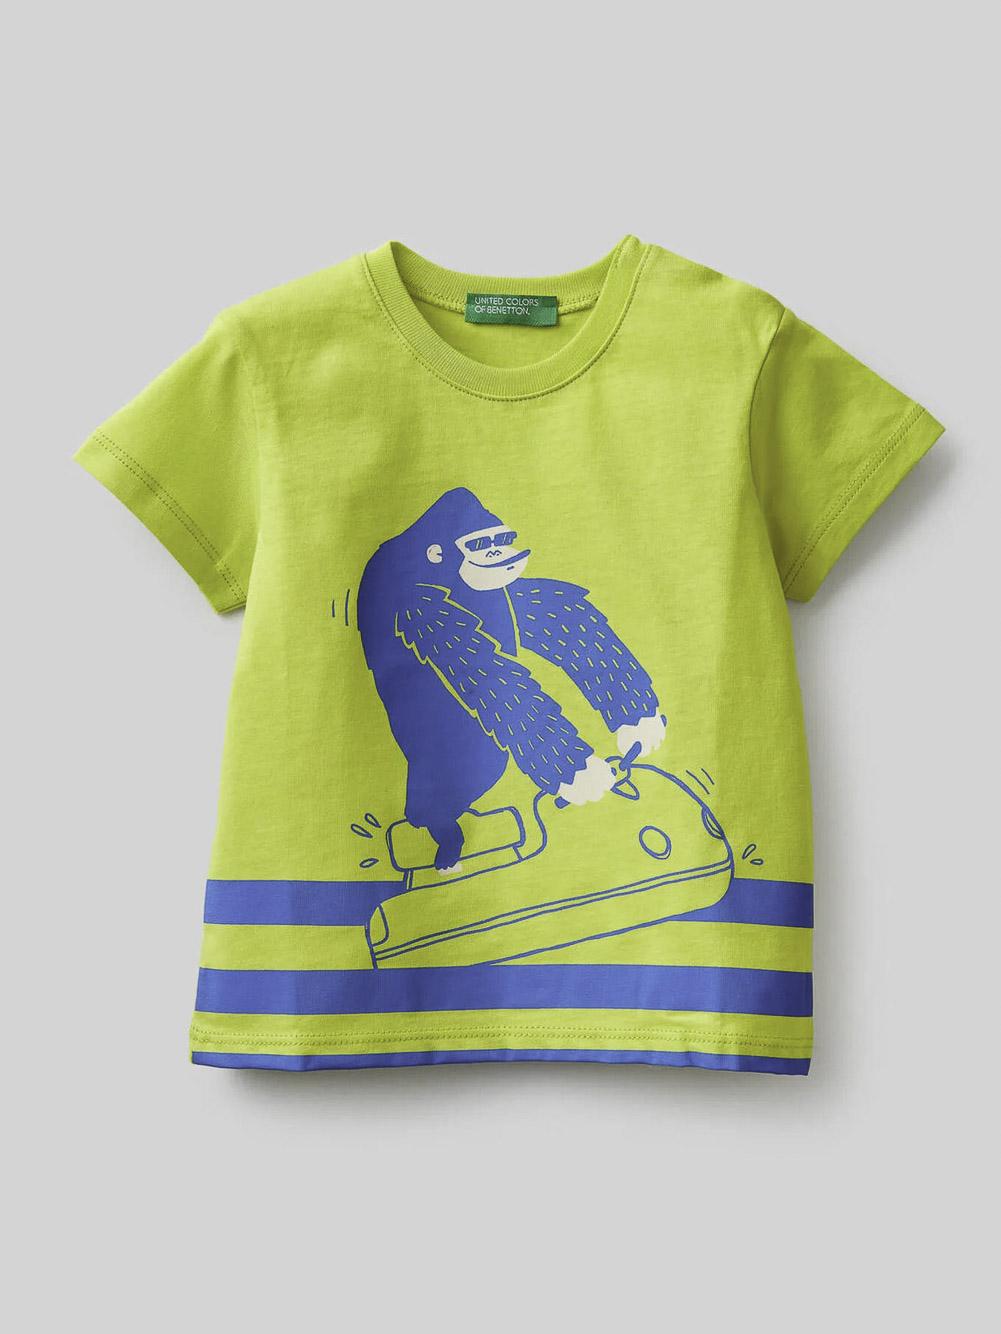 012 BENETTON Μπλούζα t-shirt 3096C15AX 21P29B